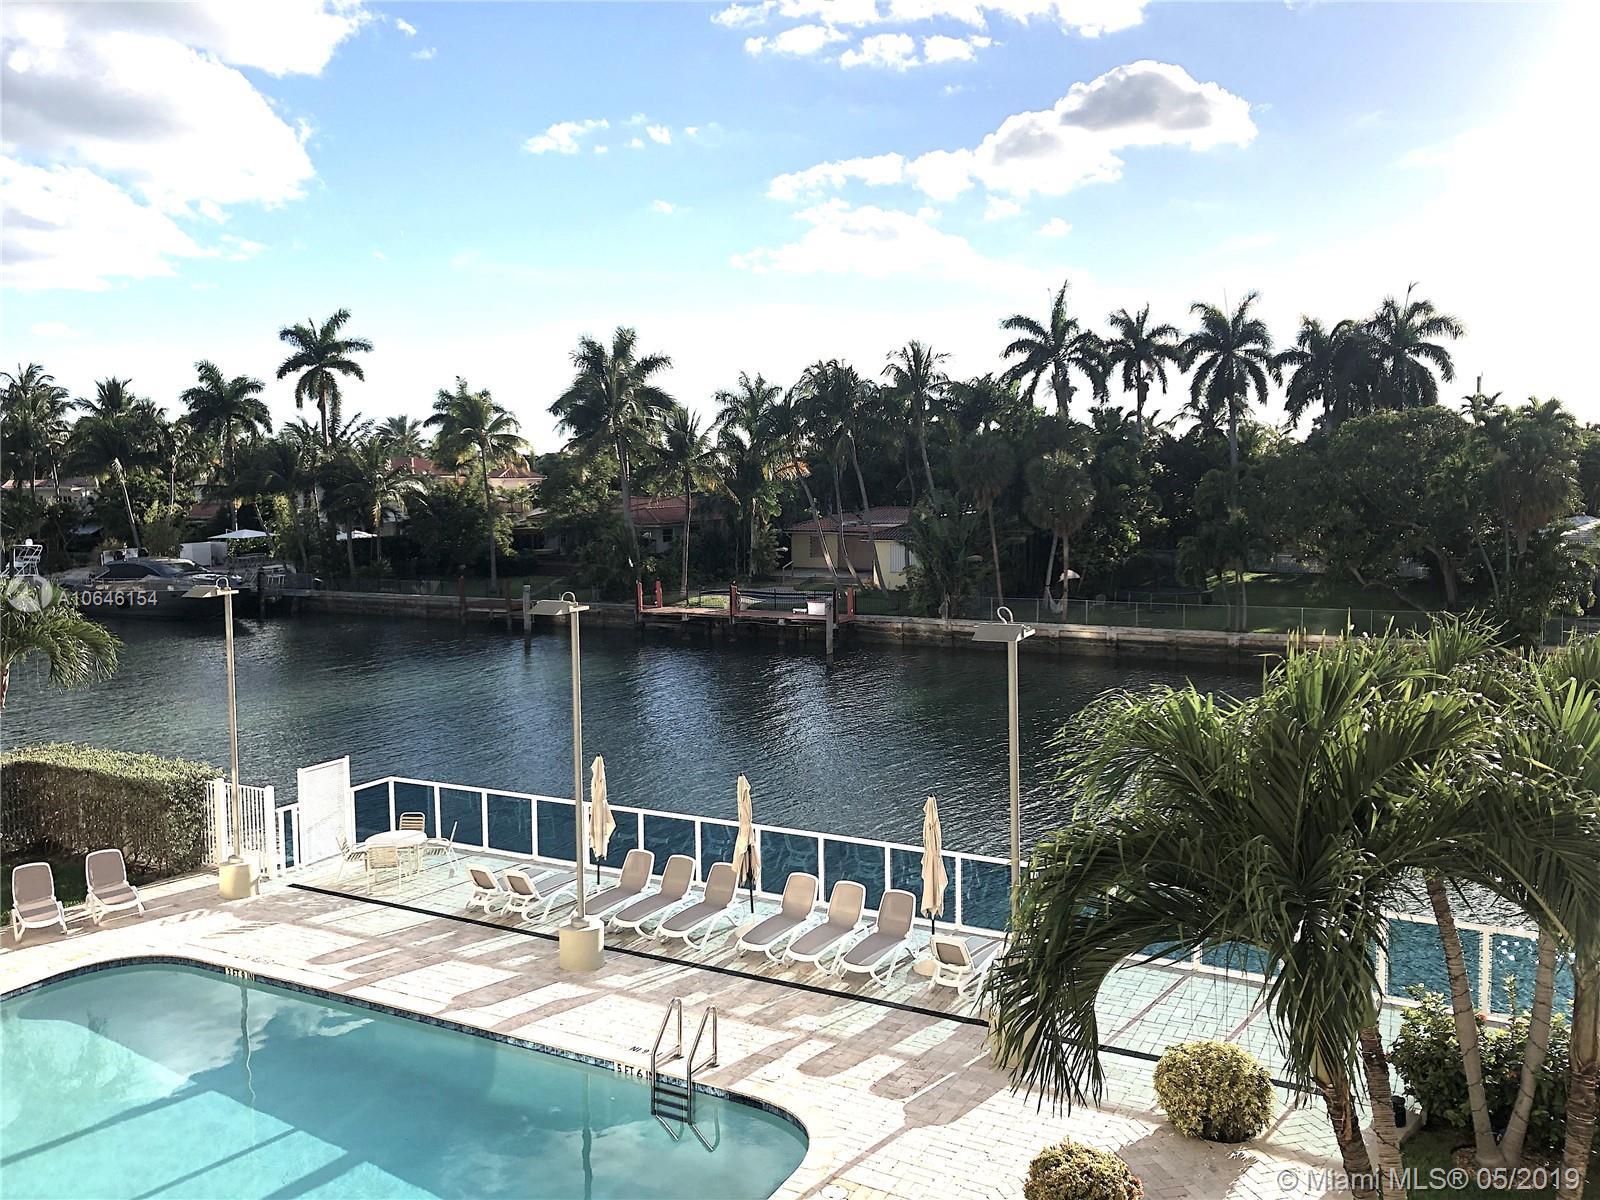 Guildford, 9800 W Bay Harbor Dr Unit 304, Bay Harbor Islands, Florida 33154